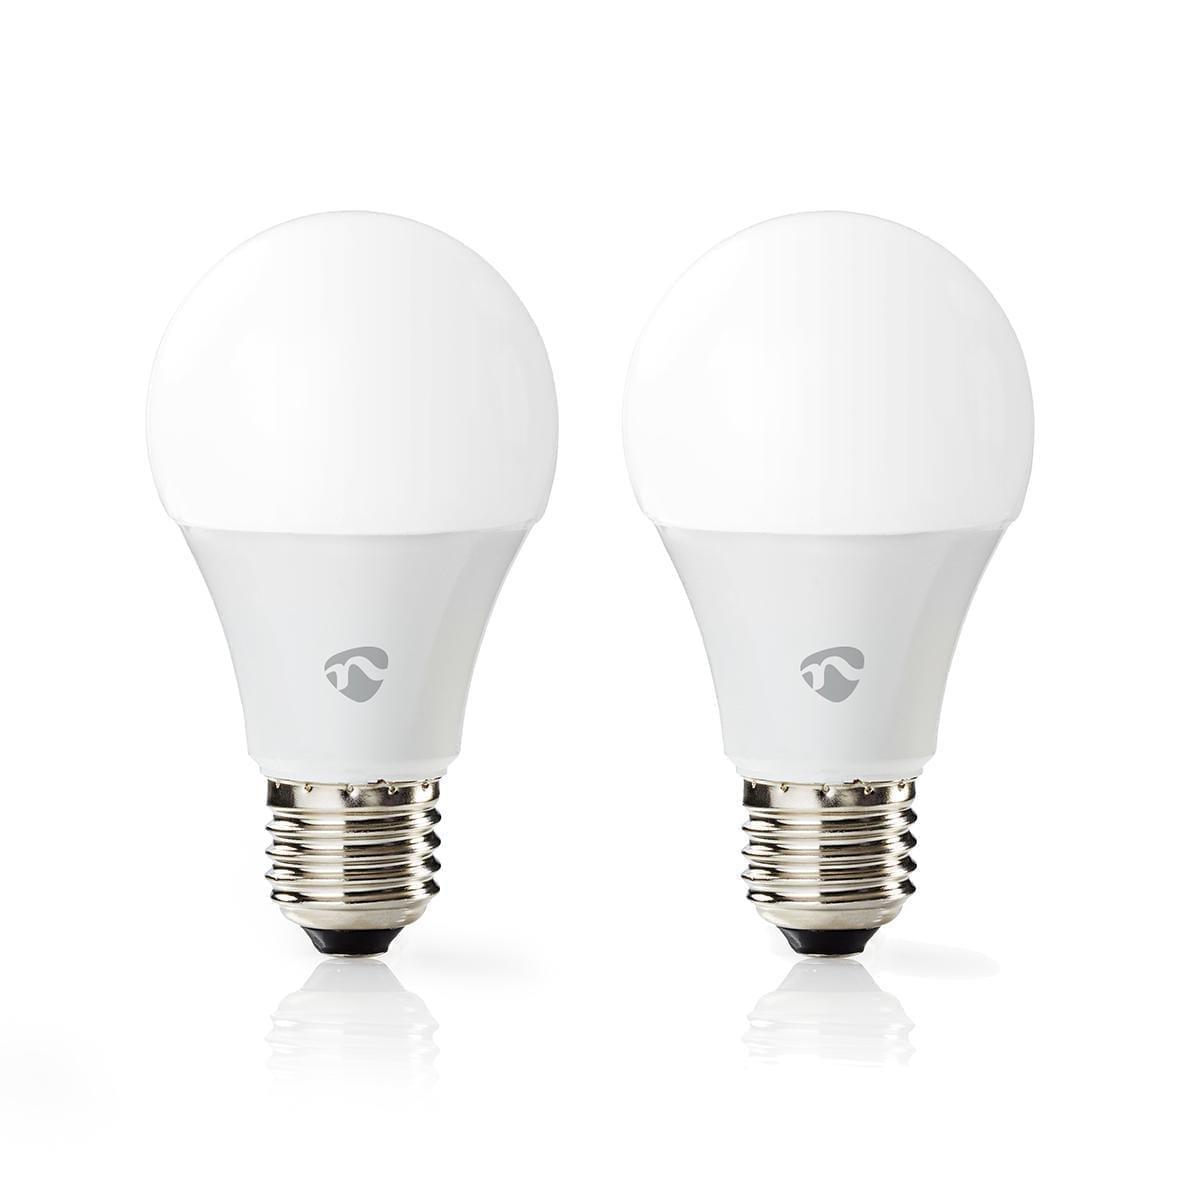 Kit 2 lampade Wi-Fi Smart 9W LED Nedis RGB